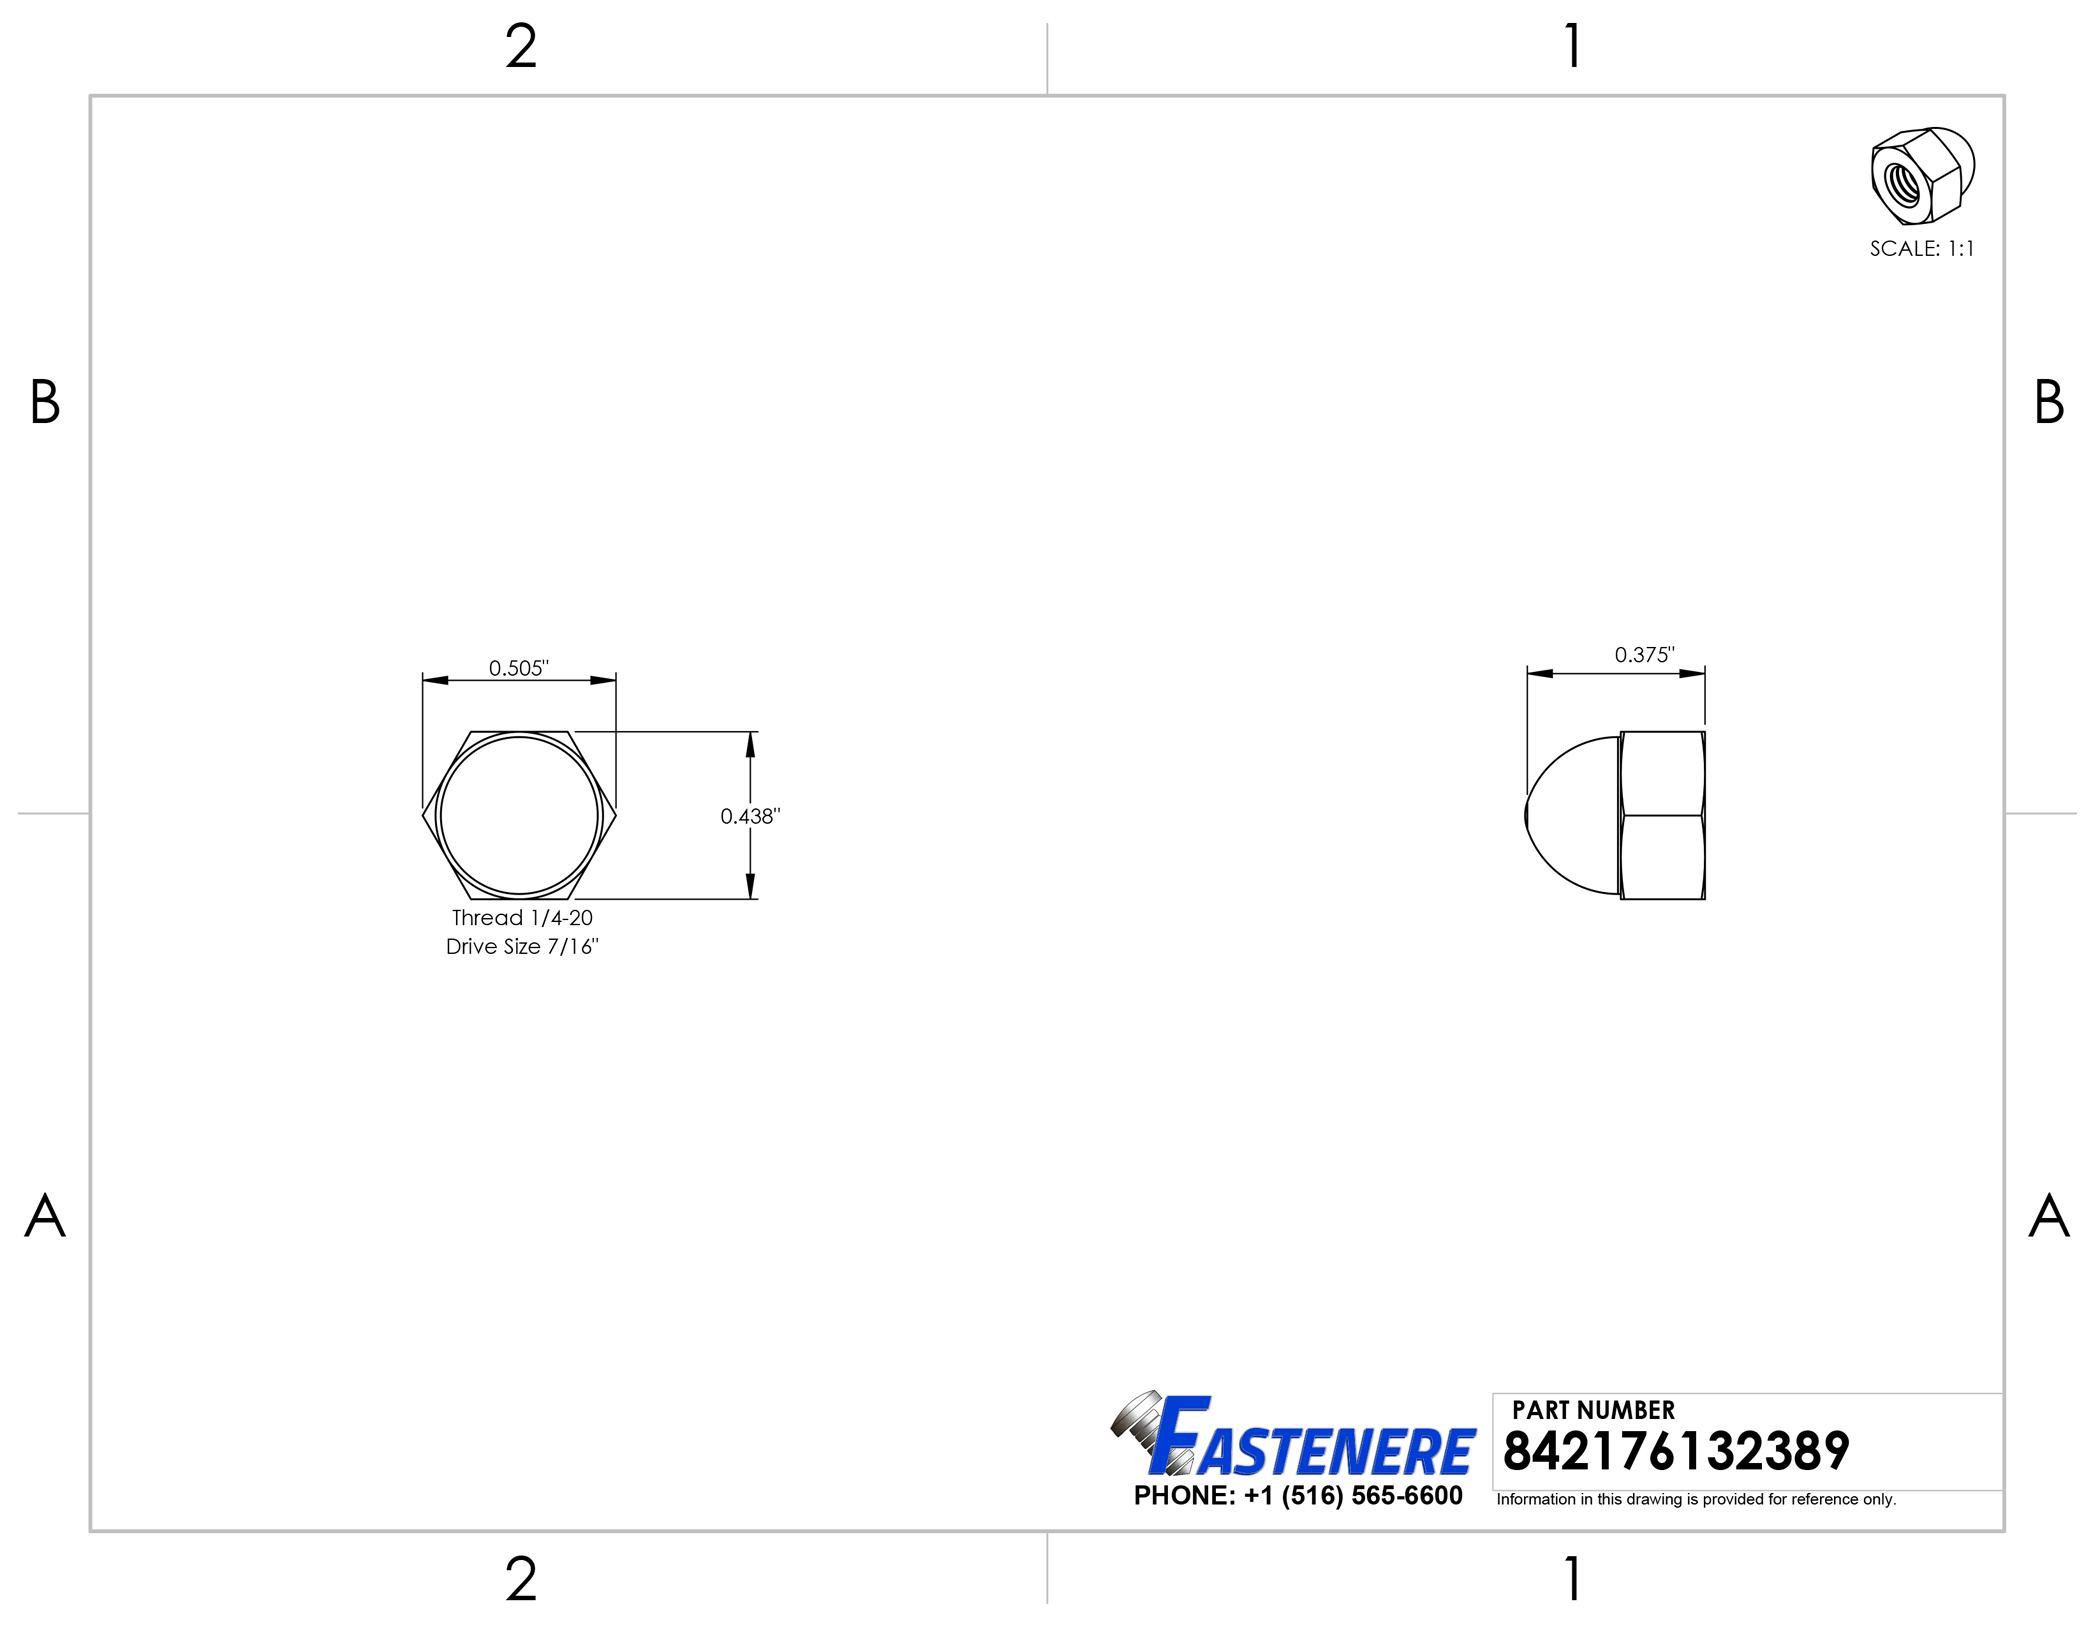 Commercial Solid Brass Plain Finish Grade 360 Quantity 50 10-32 Hex Cap Nuts